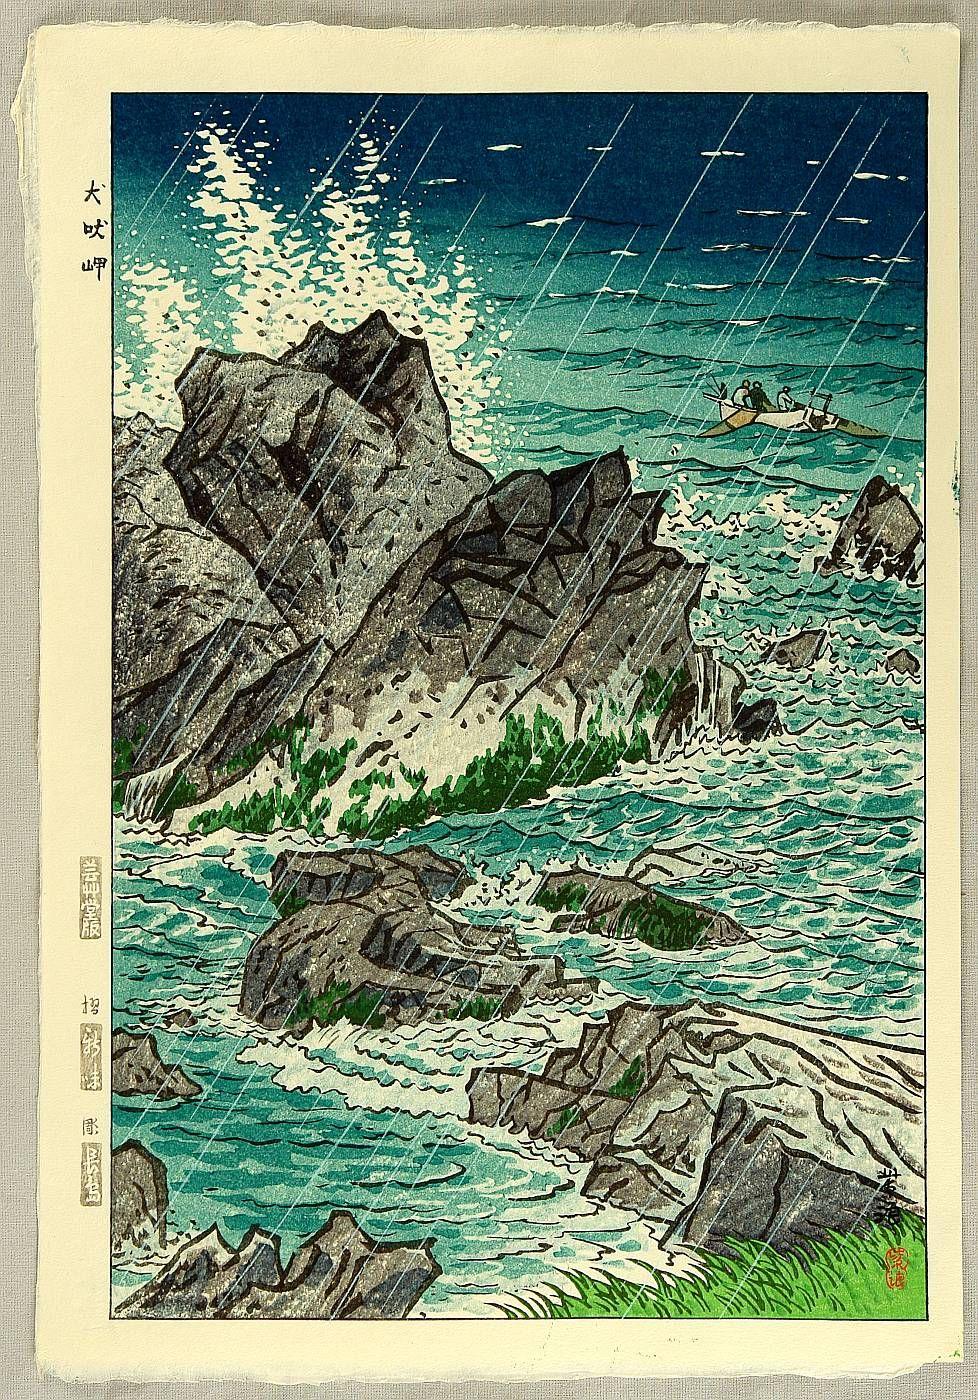 Kasamatsu Shiro: Inubosaki Cape - 1956